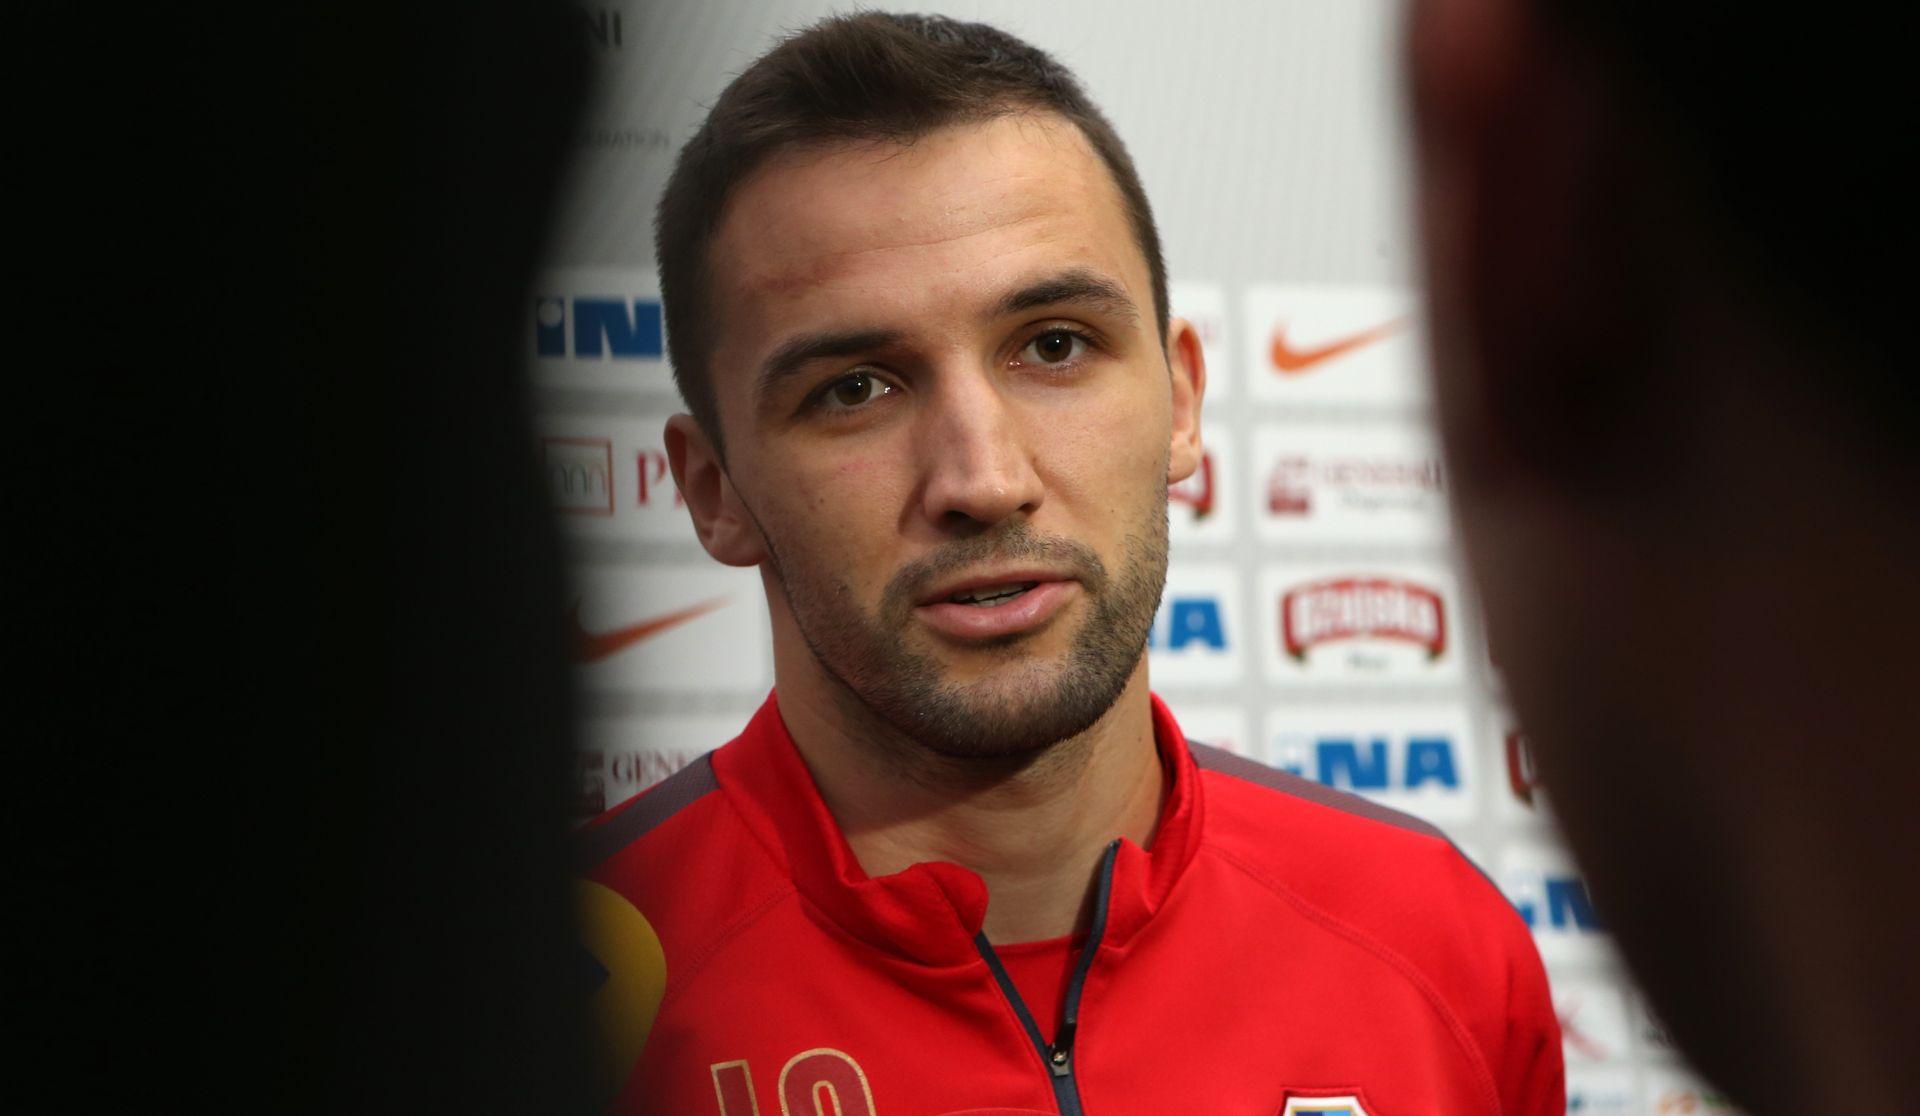 OZLJEDA PROTIV LAZIJA Milan Badelj pauzira najmanje mjesec i pol dana